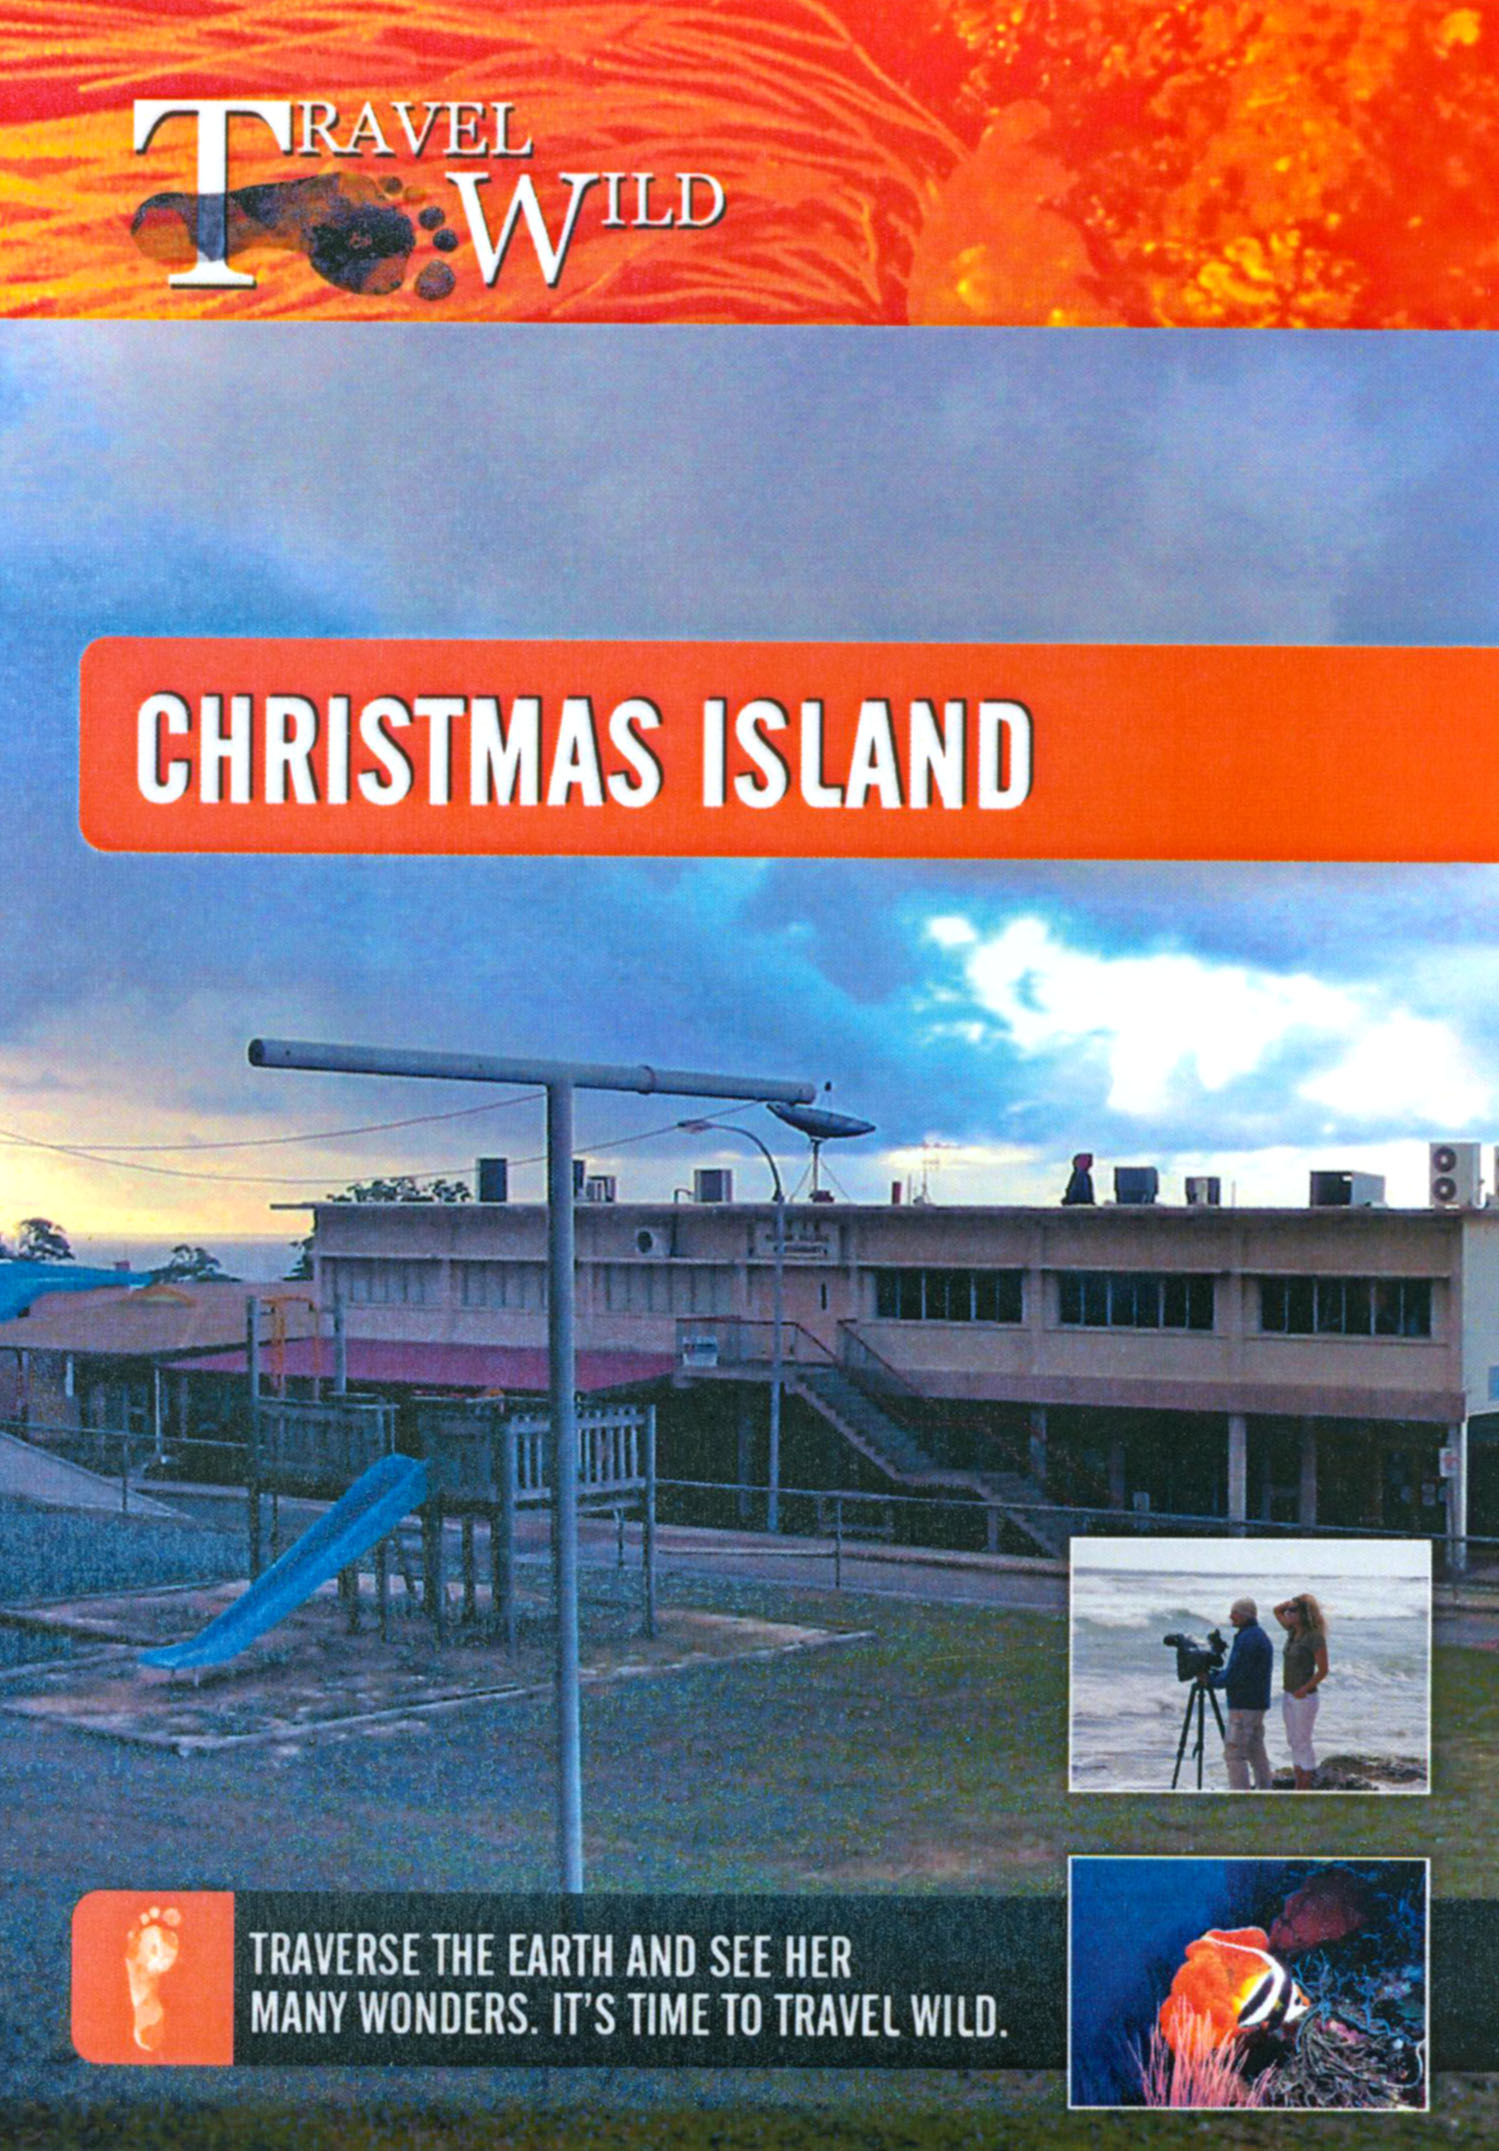 Travel Wild: Christmas Island